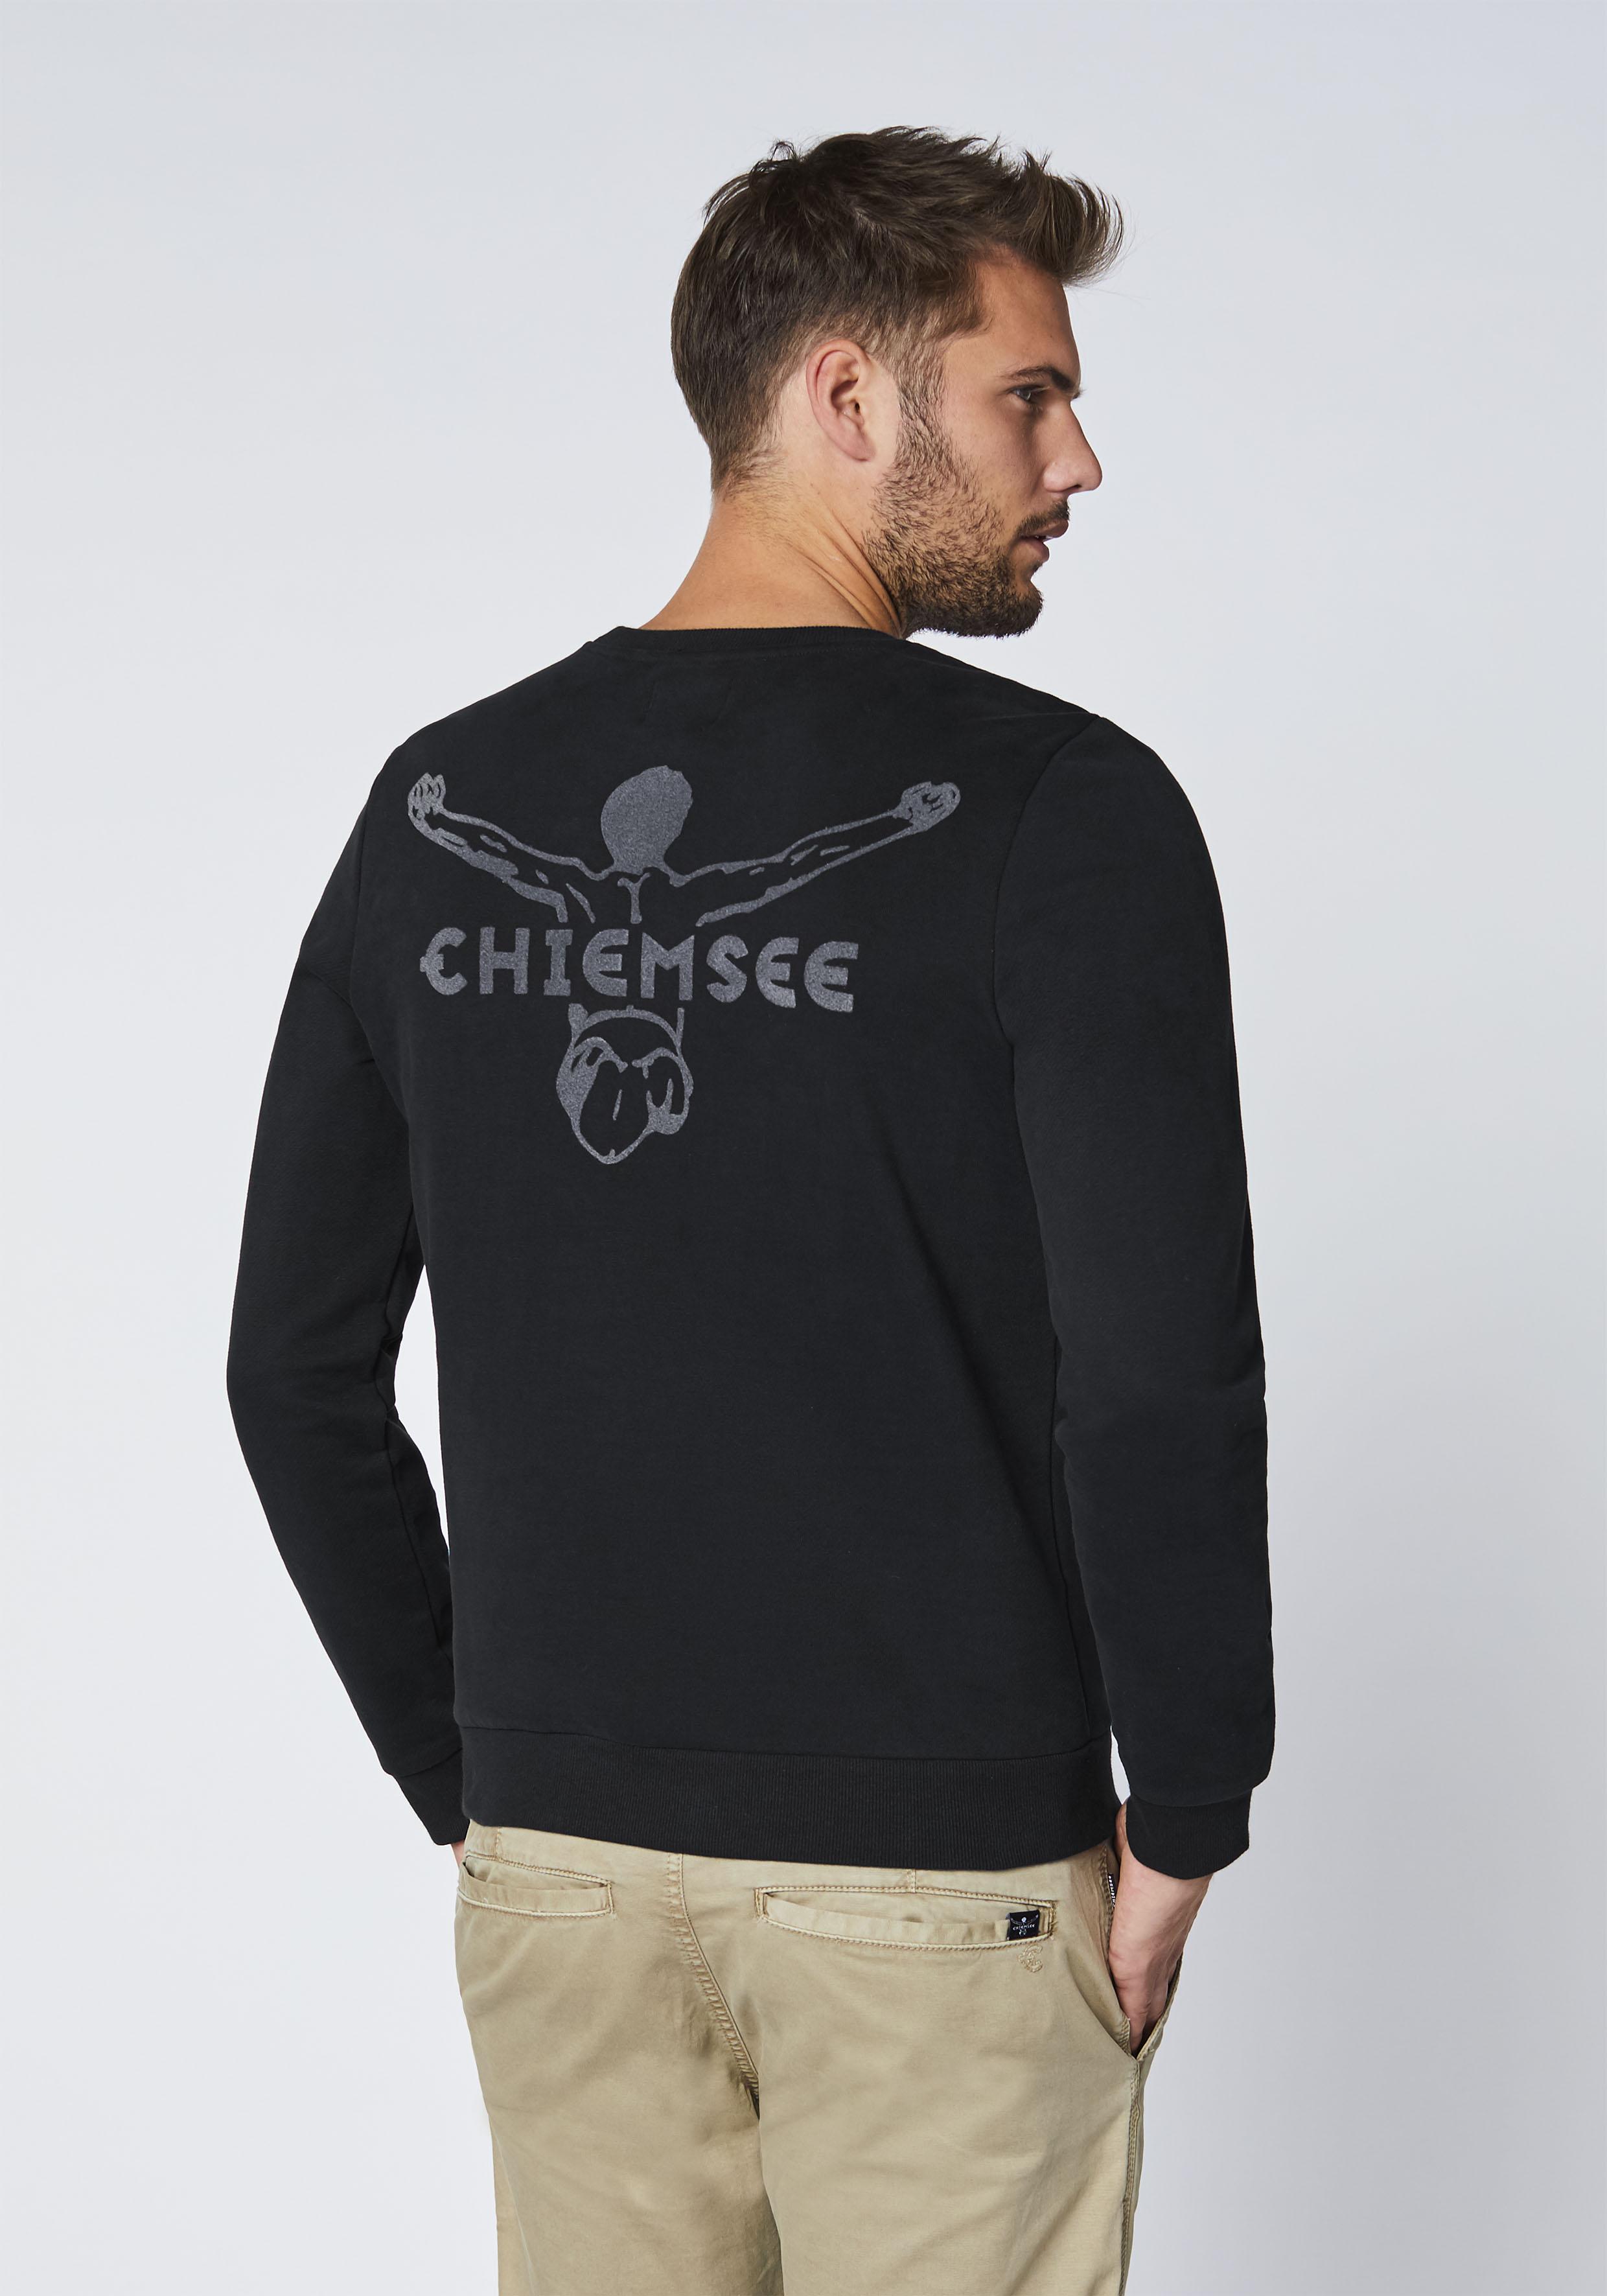 chiemsee -  Sweatshirt Sweatshirt für Herren